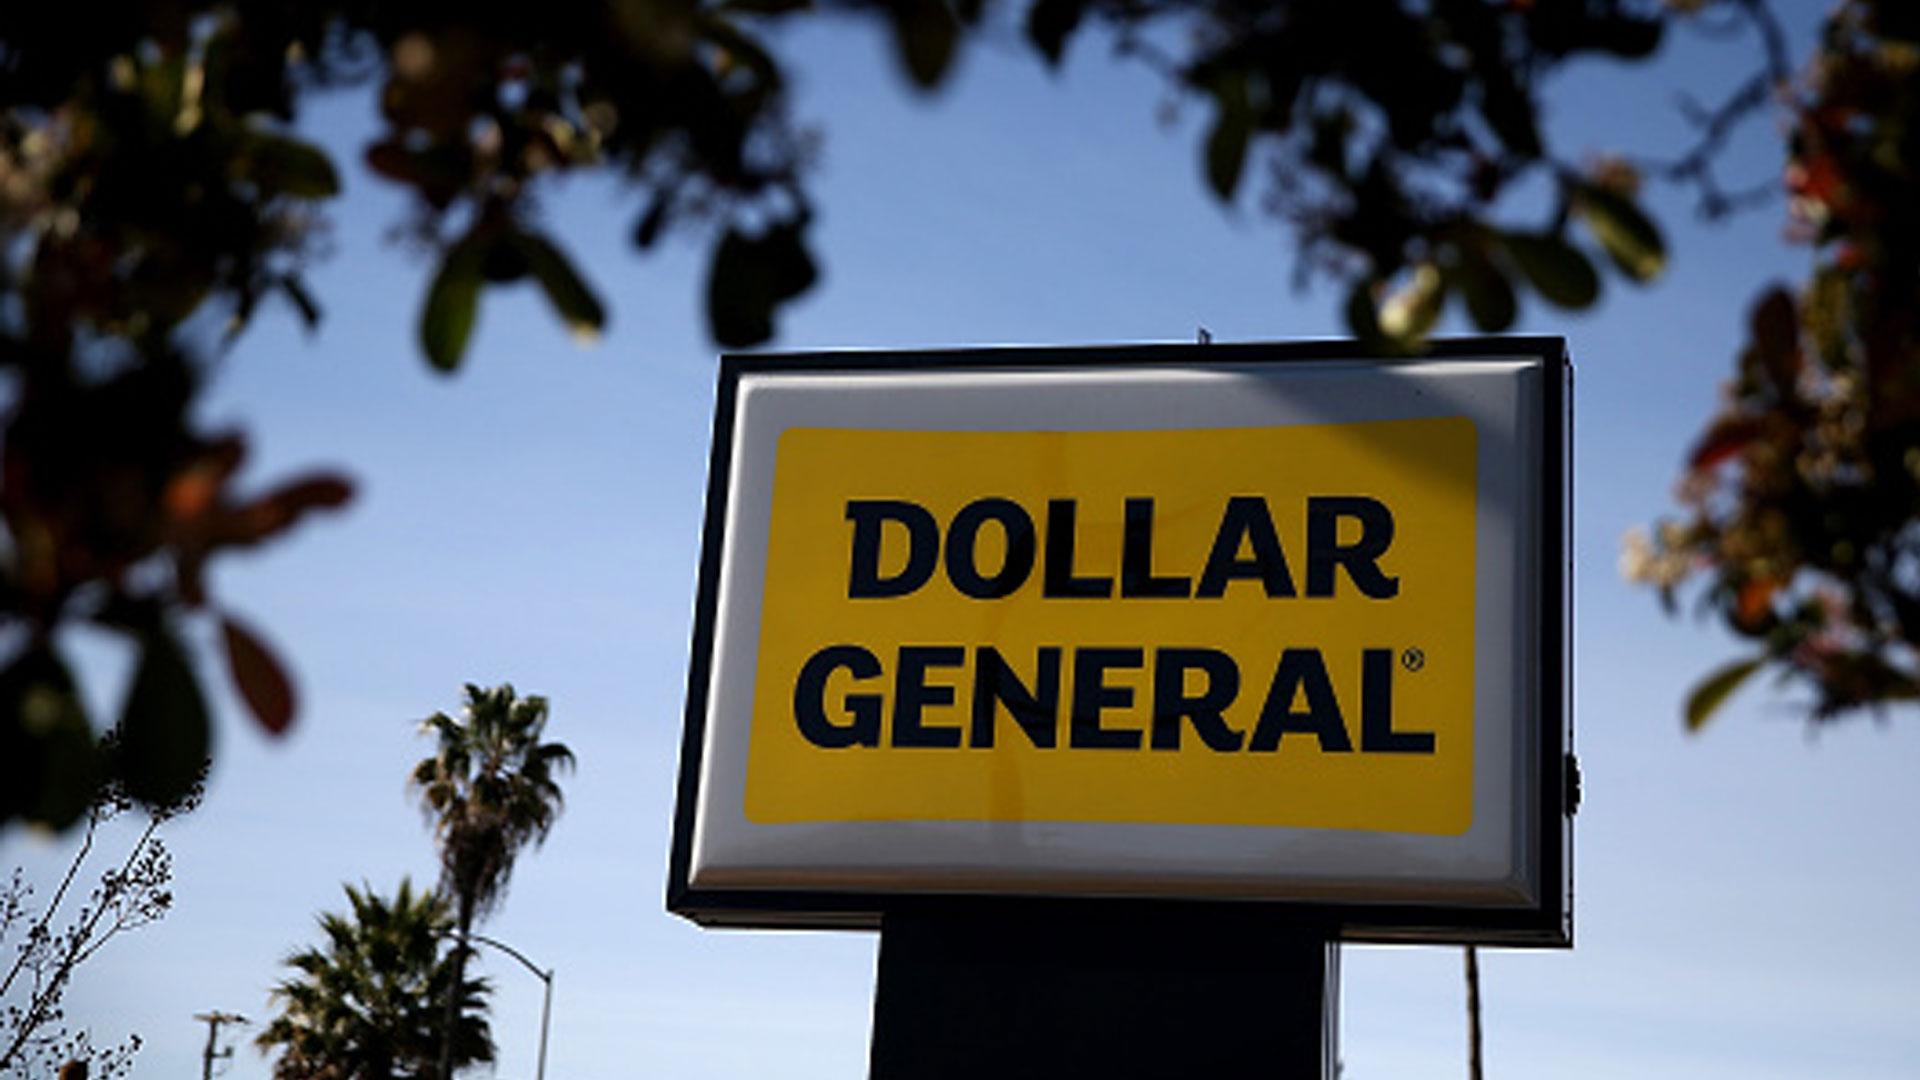 dollar-general_1532173069477.jpg